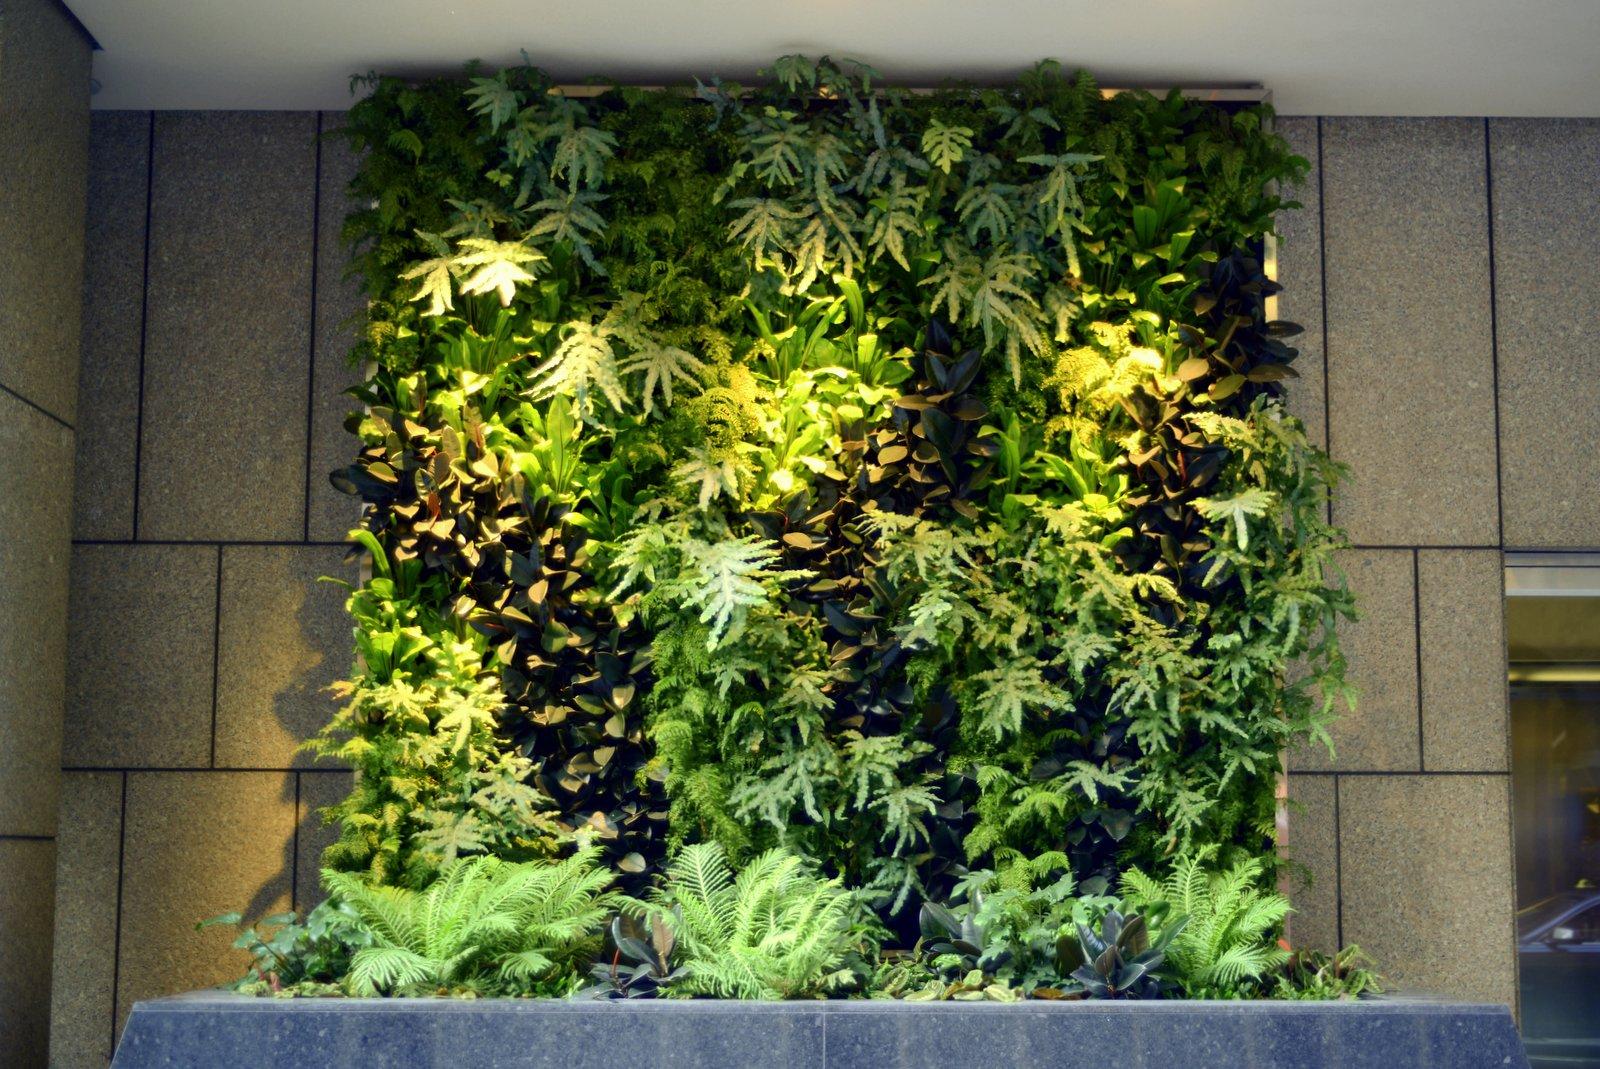 Plants On Walls vertical garden systems: 6 Months Mature ...